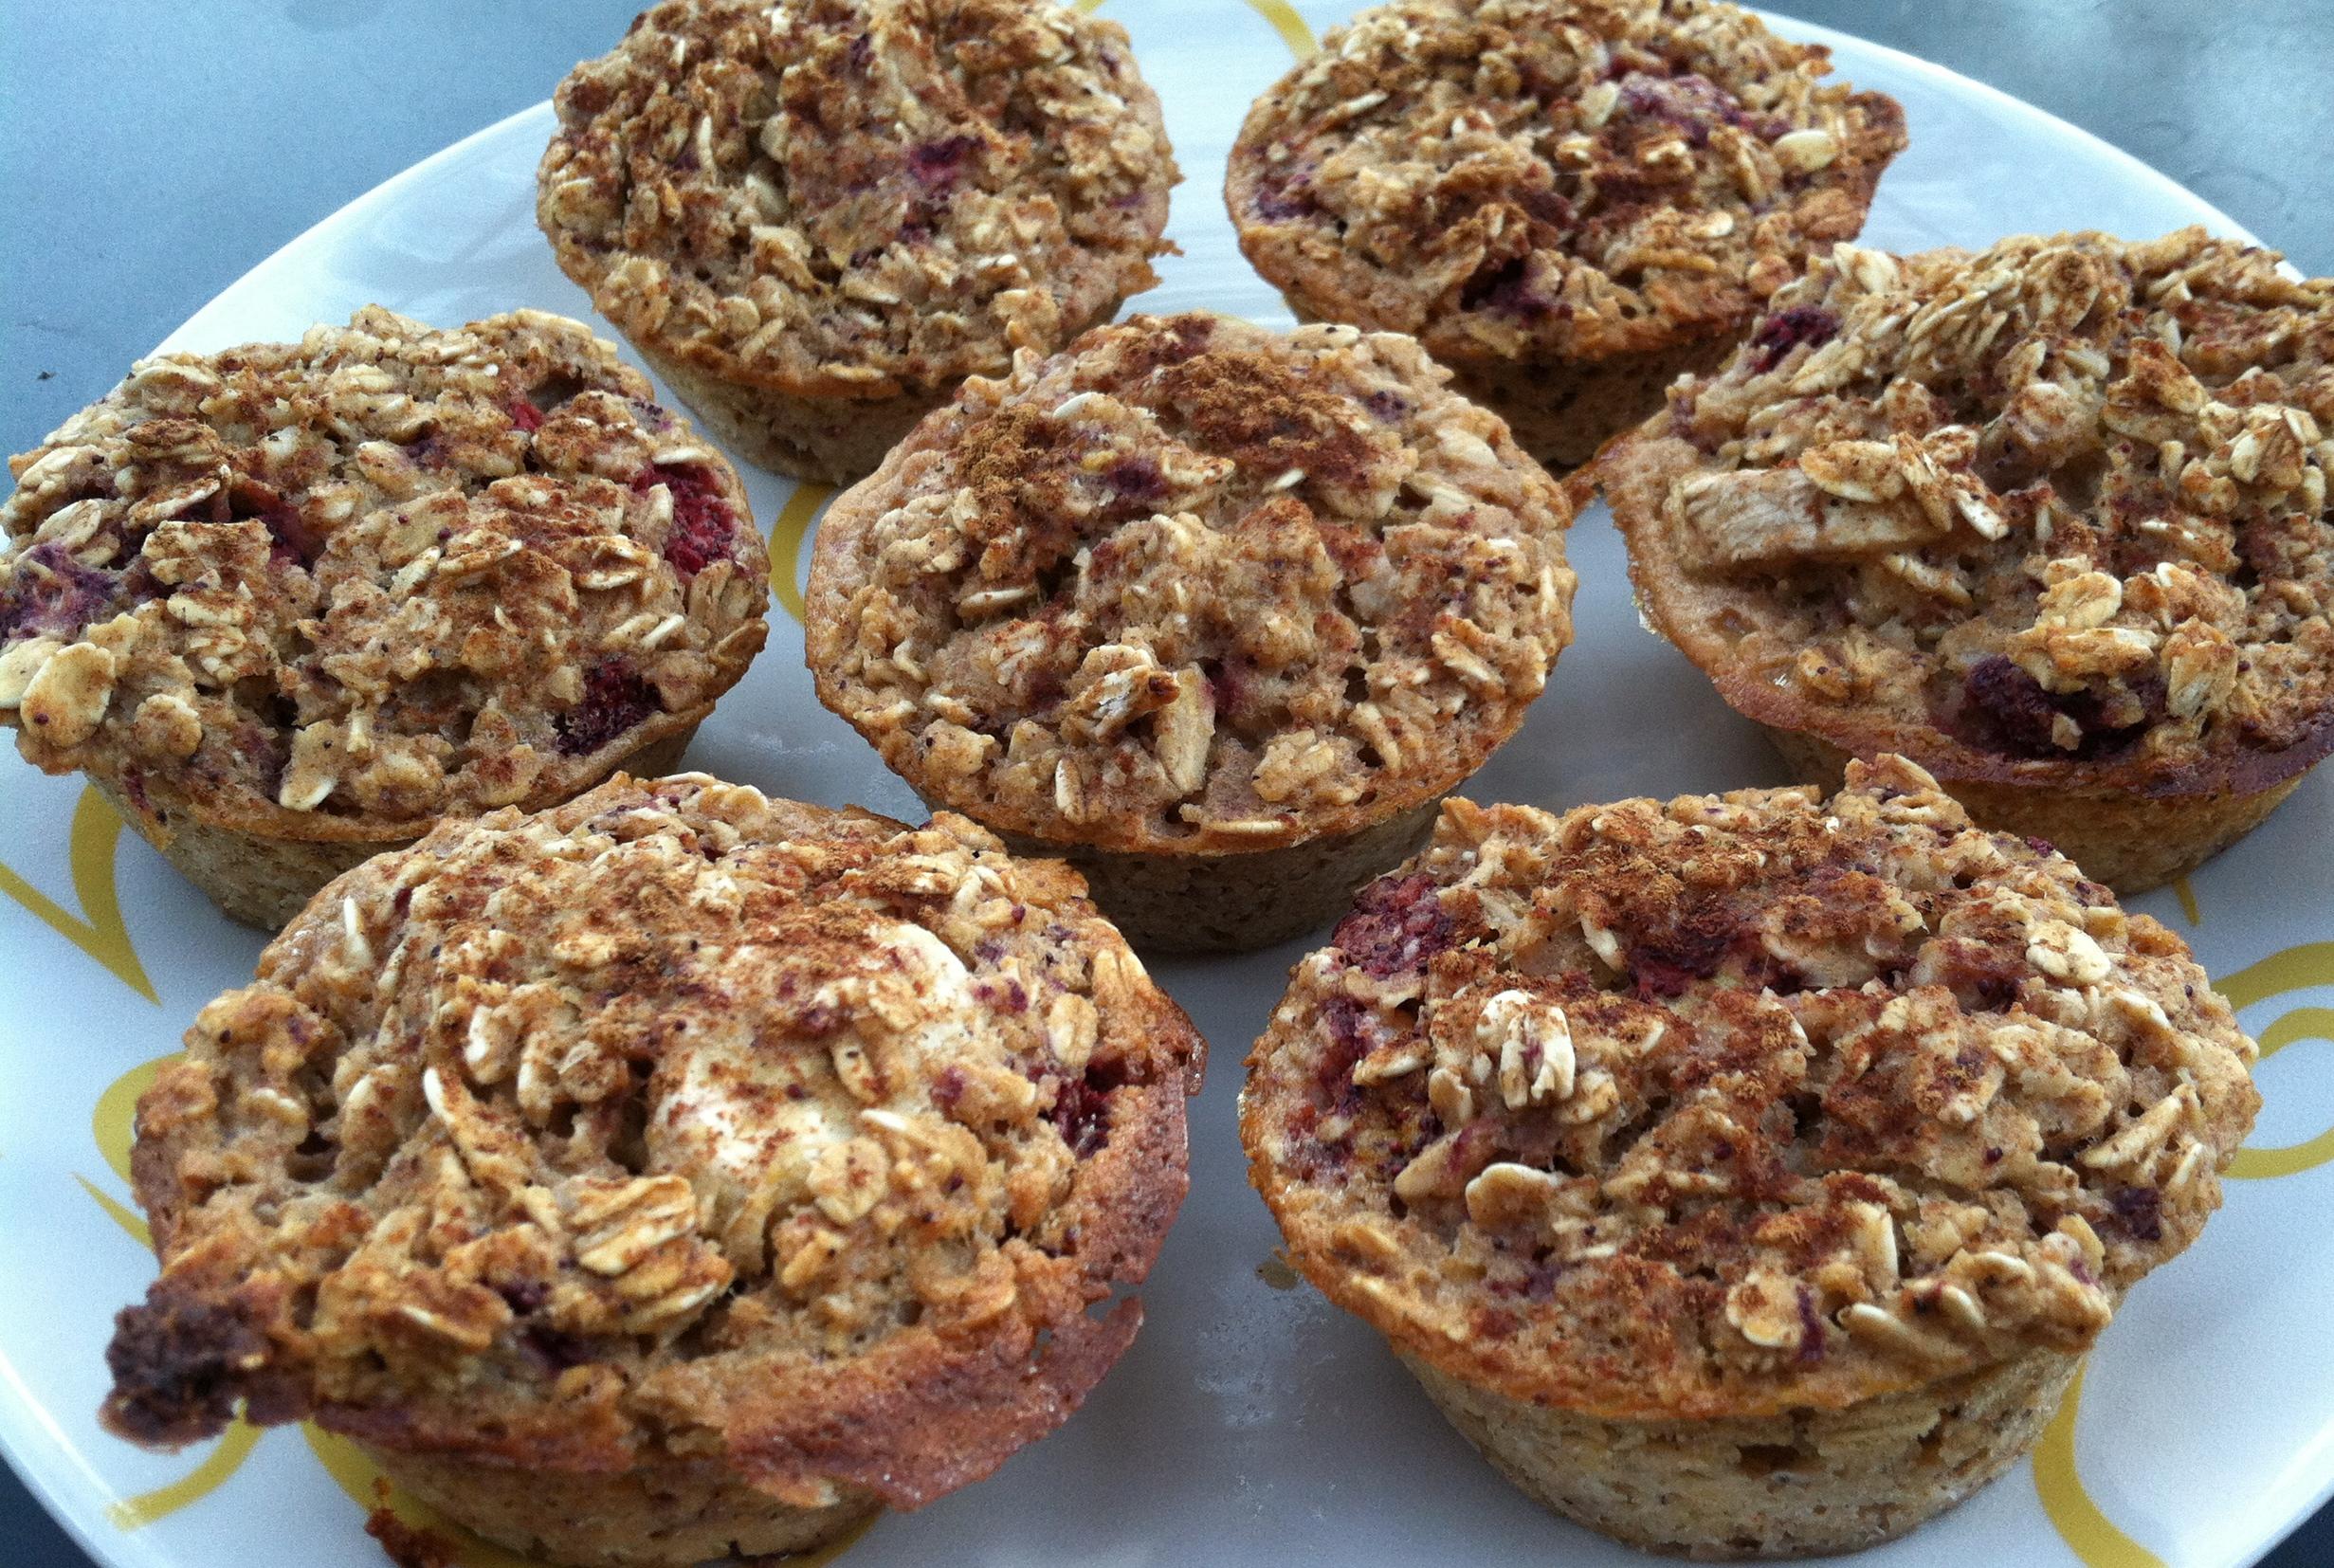 Wild Strawberry Banana Oatmeal Muffins - Marathons and Macarons